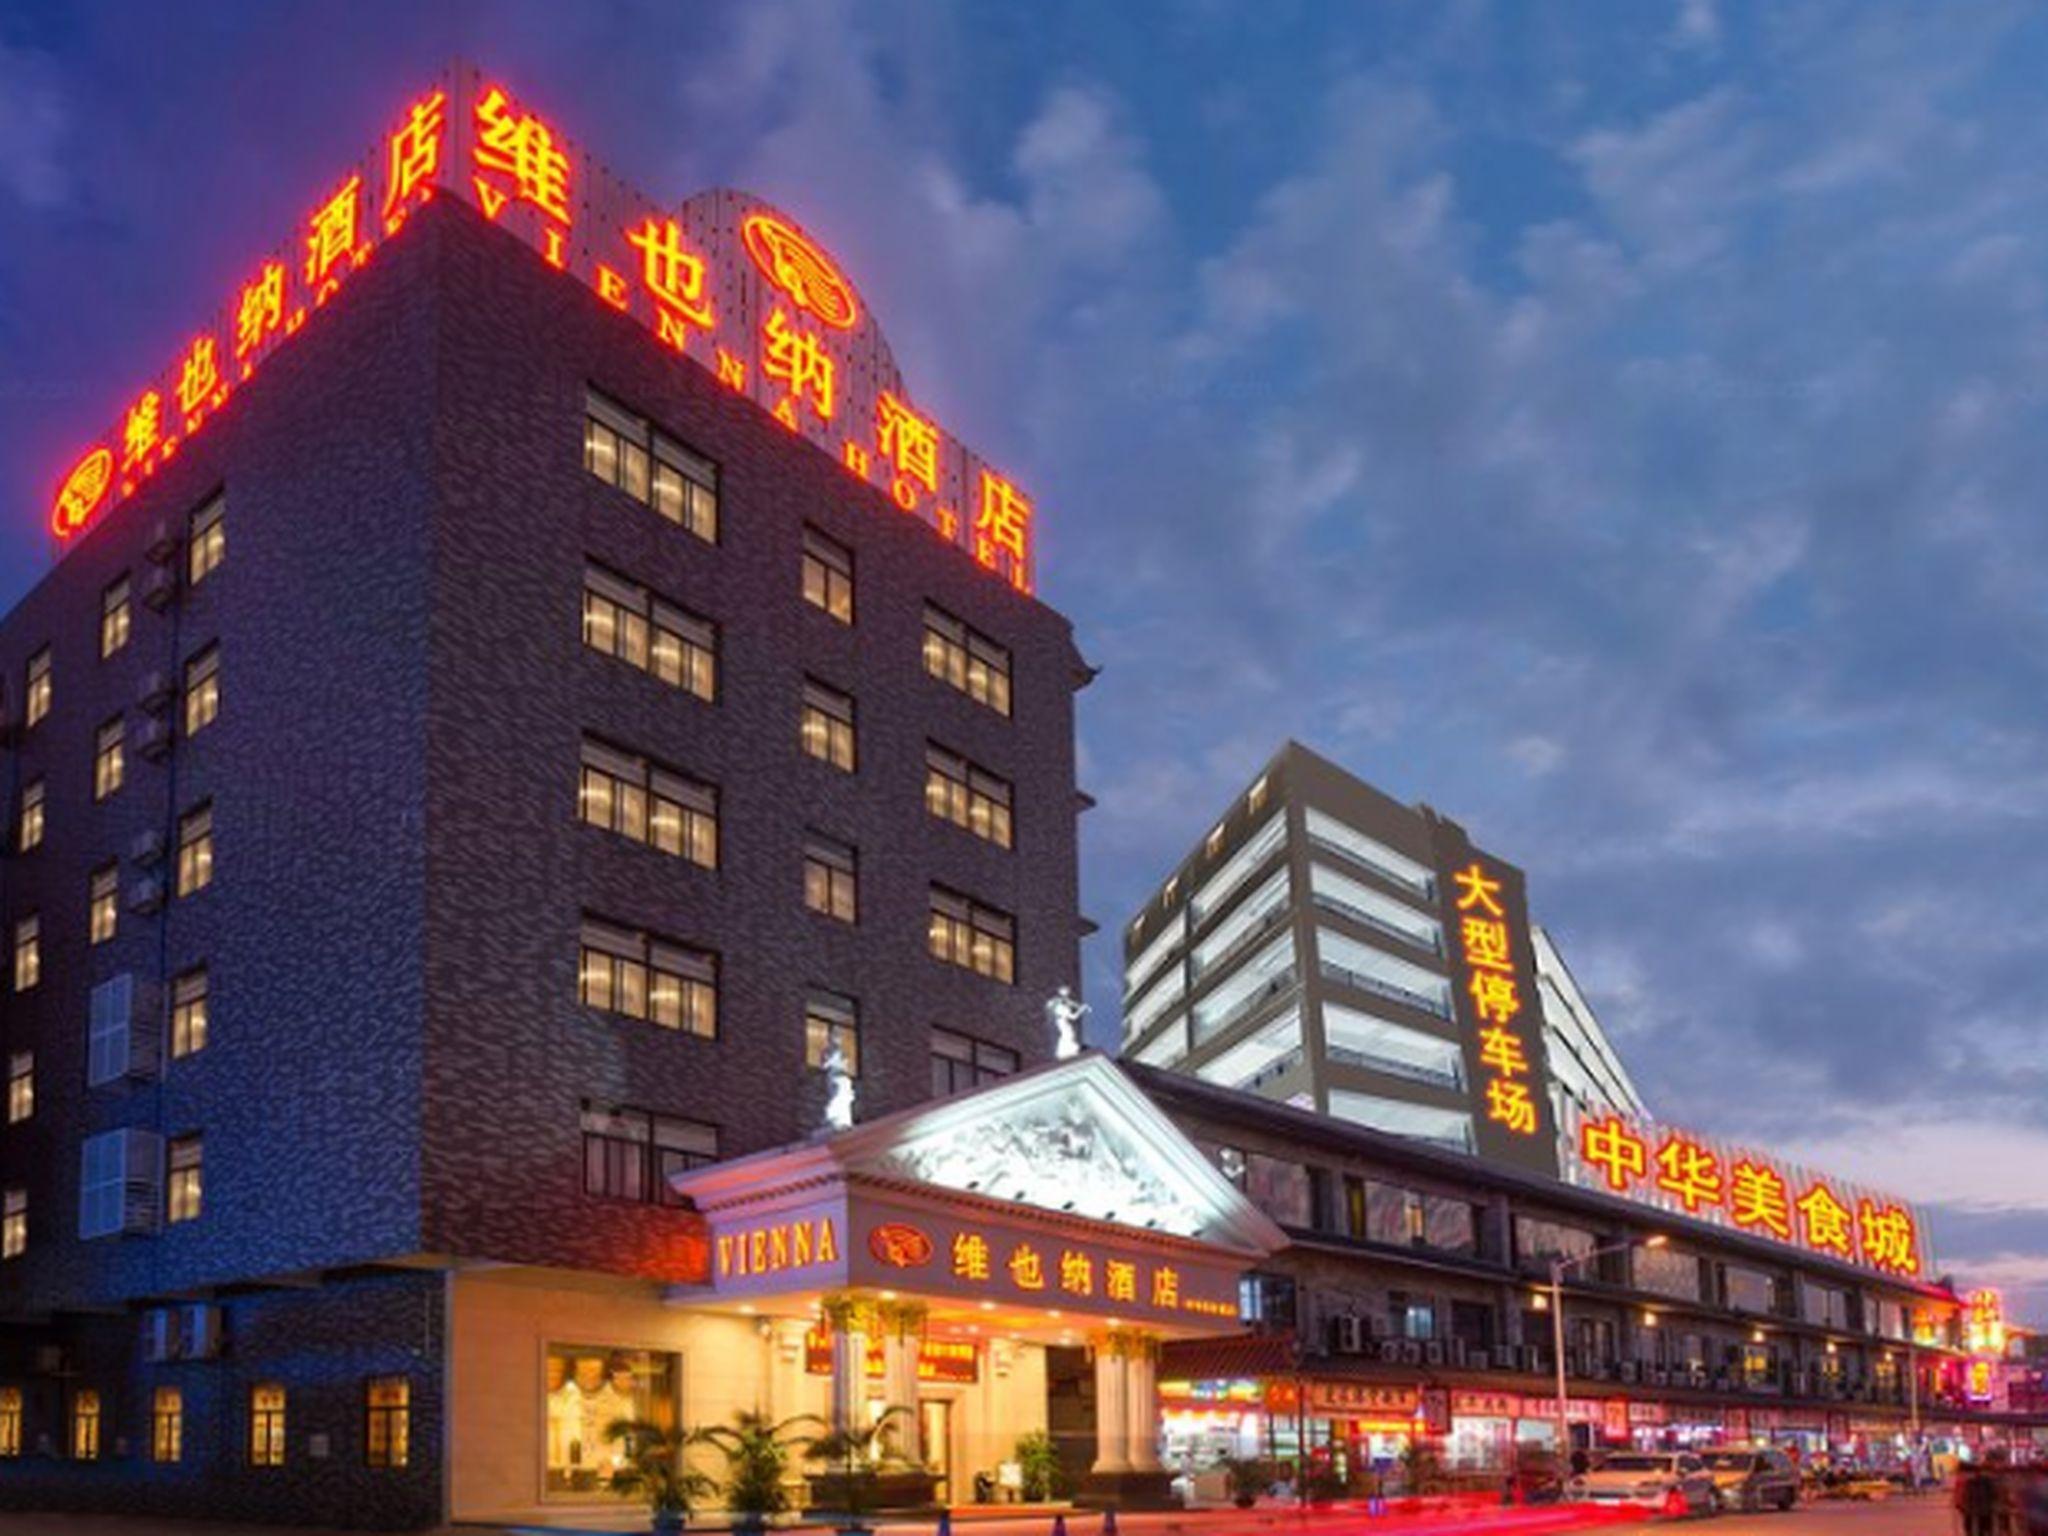 Vienna Hotel Guangzhou Changlong Chinese Food Court Branch